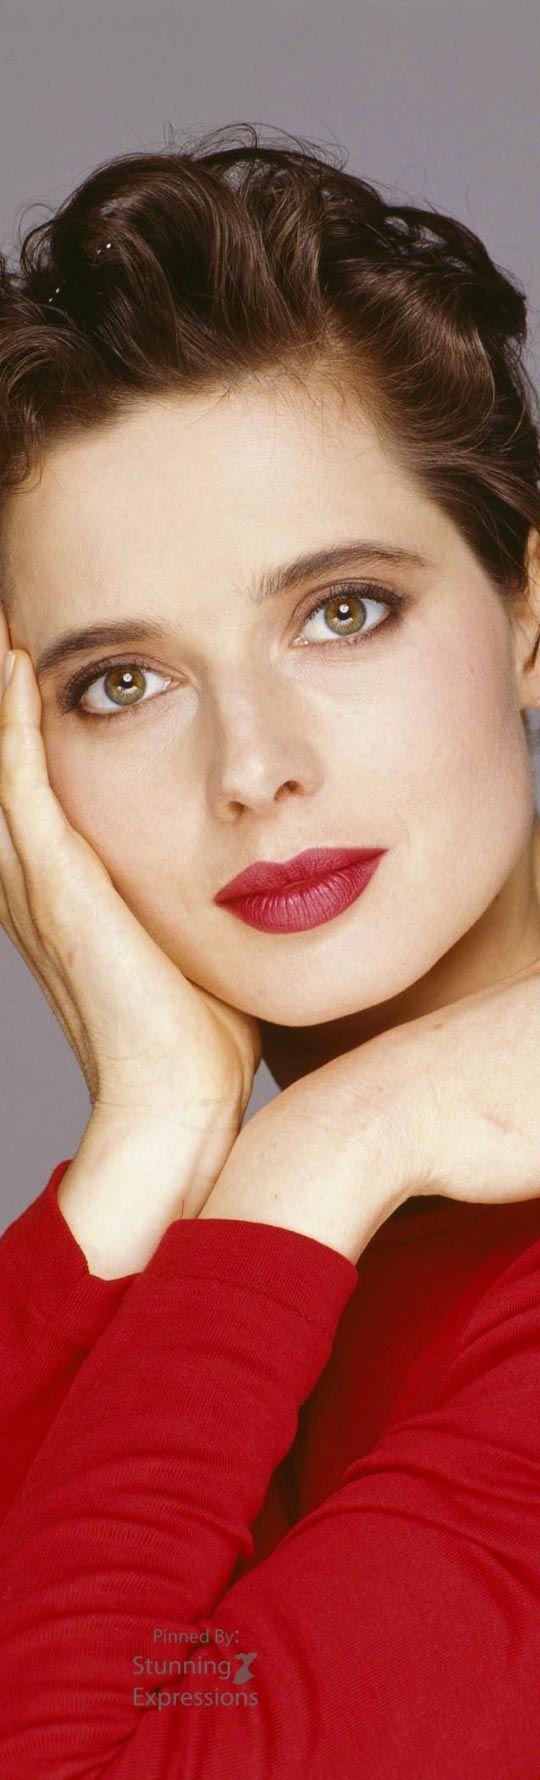 ISABELLA ROSSELLINI Isabella Fiorella Elettra Giovanna Rossellini (born 18 June 1952) is an Italian actress, filmmaker, author, philanthropist, and model.